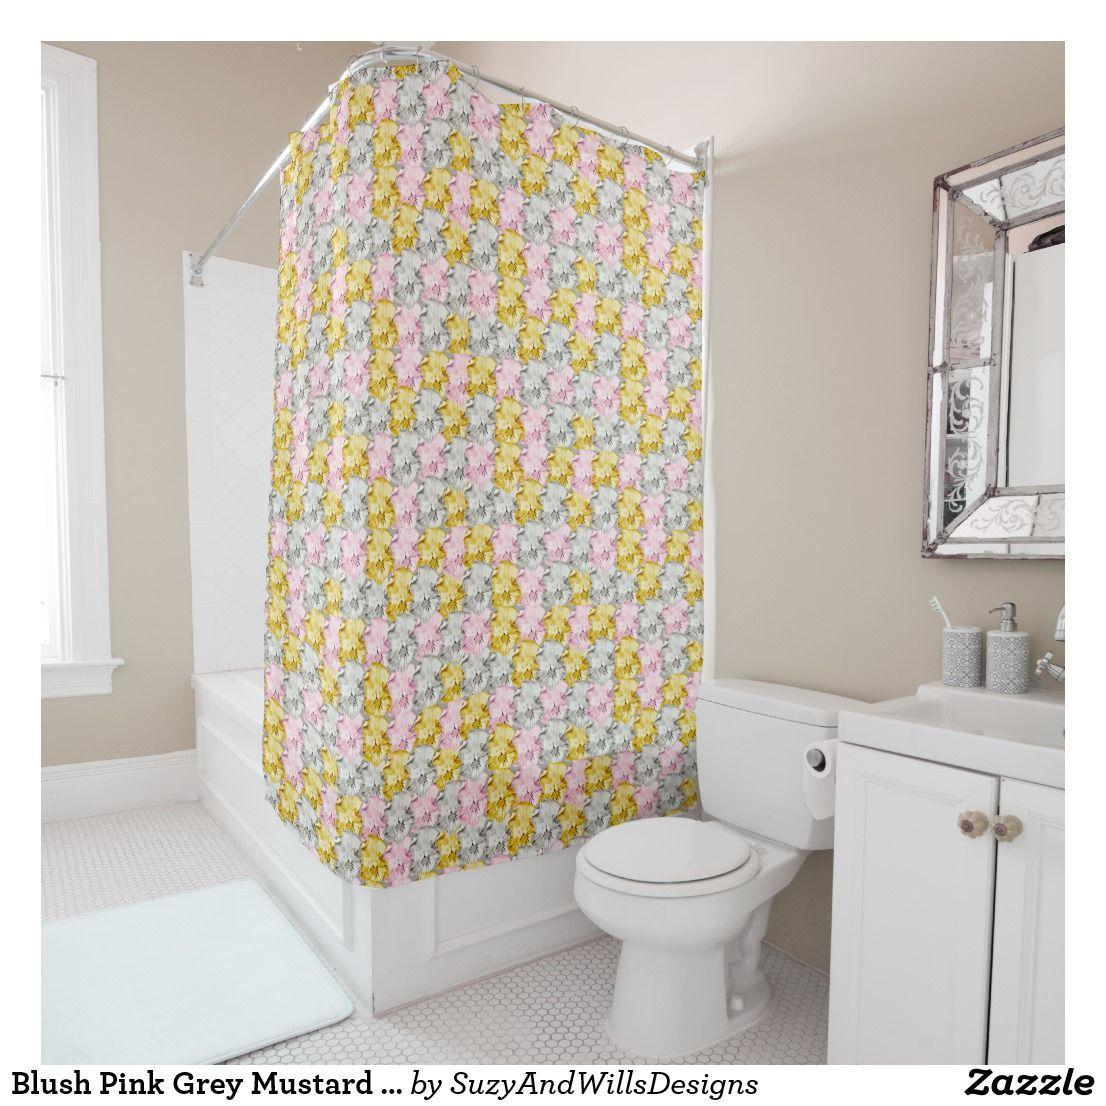 Blush Pink Grey Mustard Floral Print Shower Curtai Shower Curtain